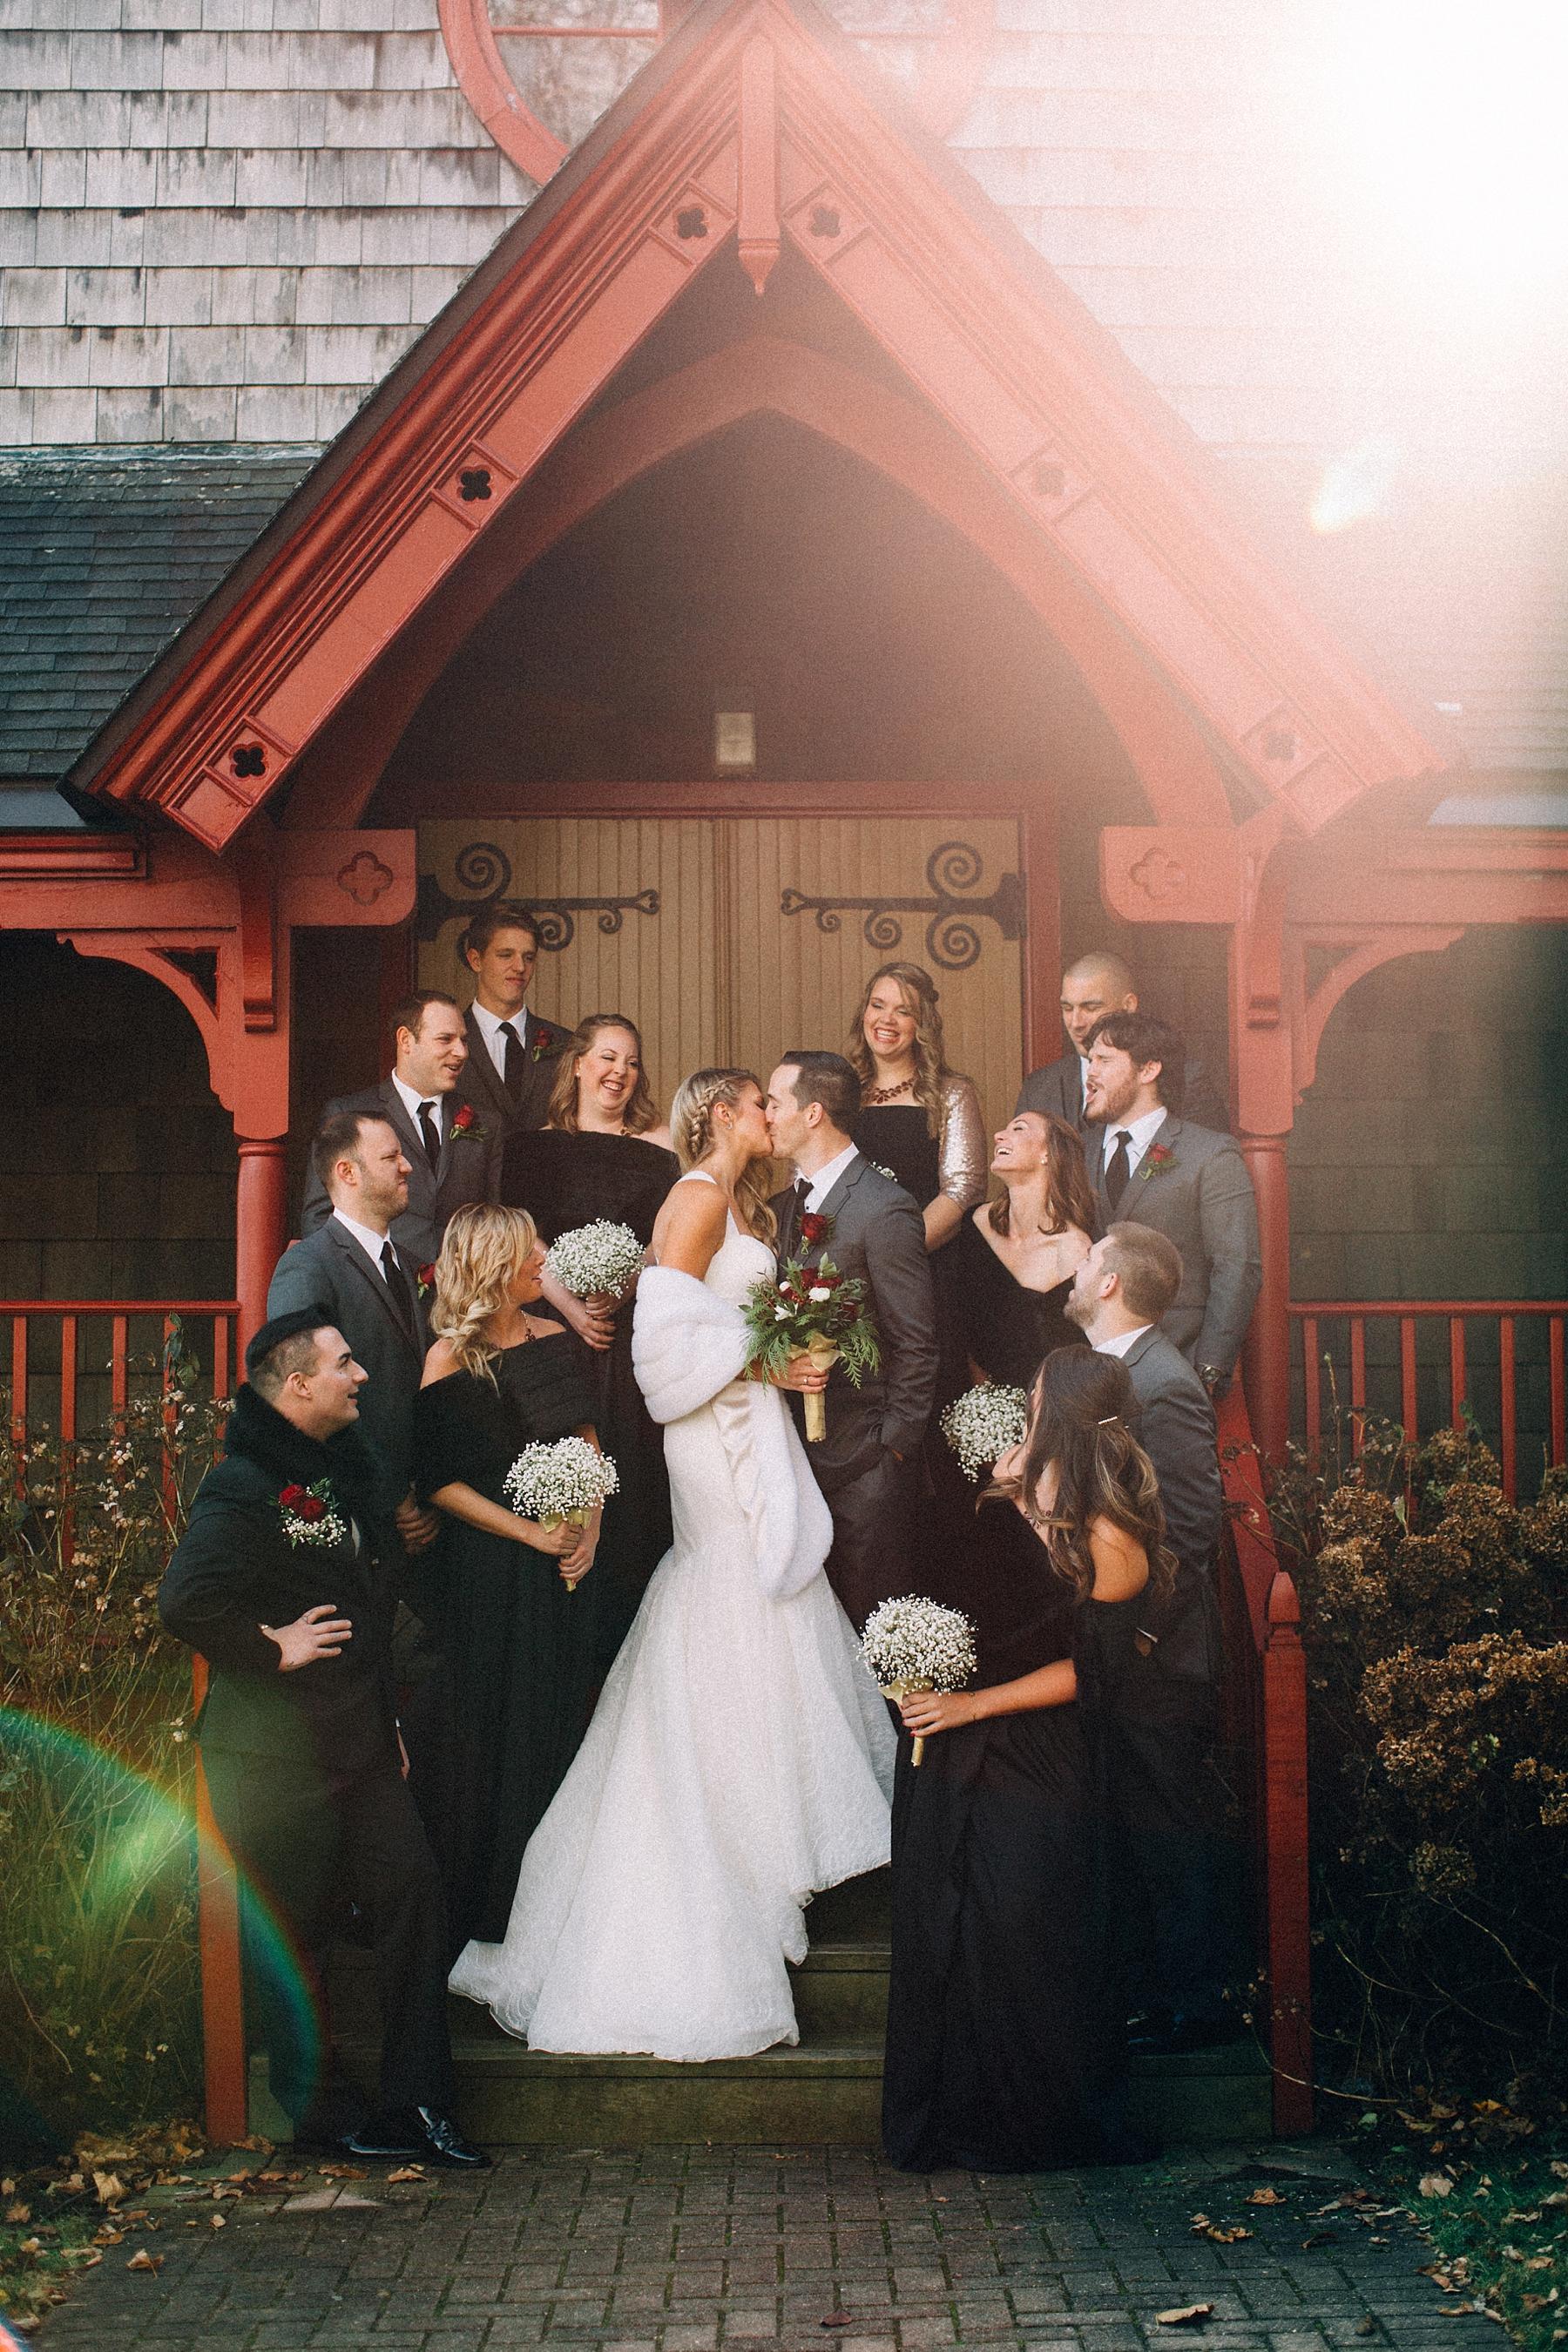 nj-monmouth-county-wedding-photographer-long-branch_0019.jpg